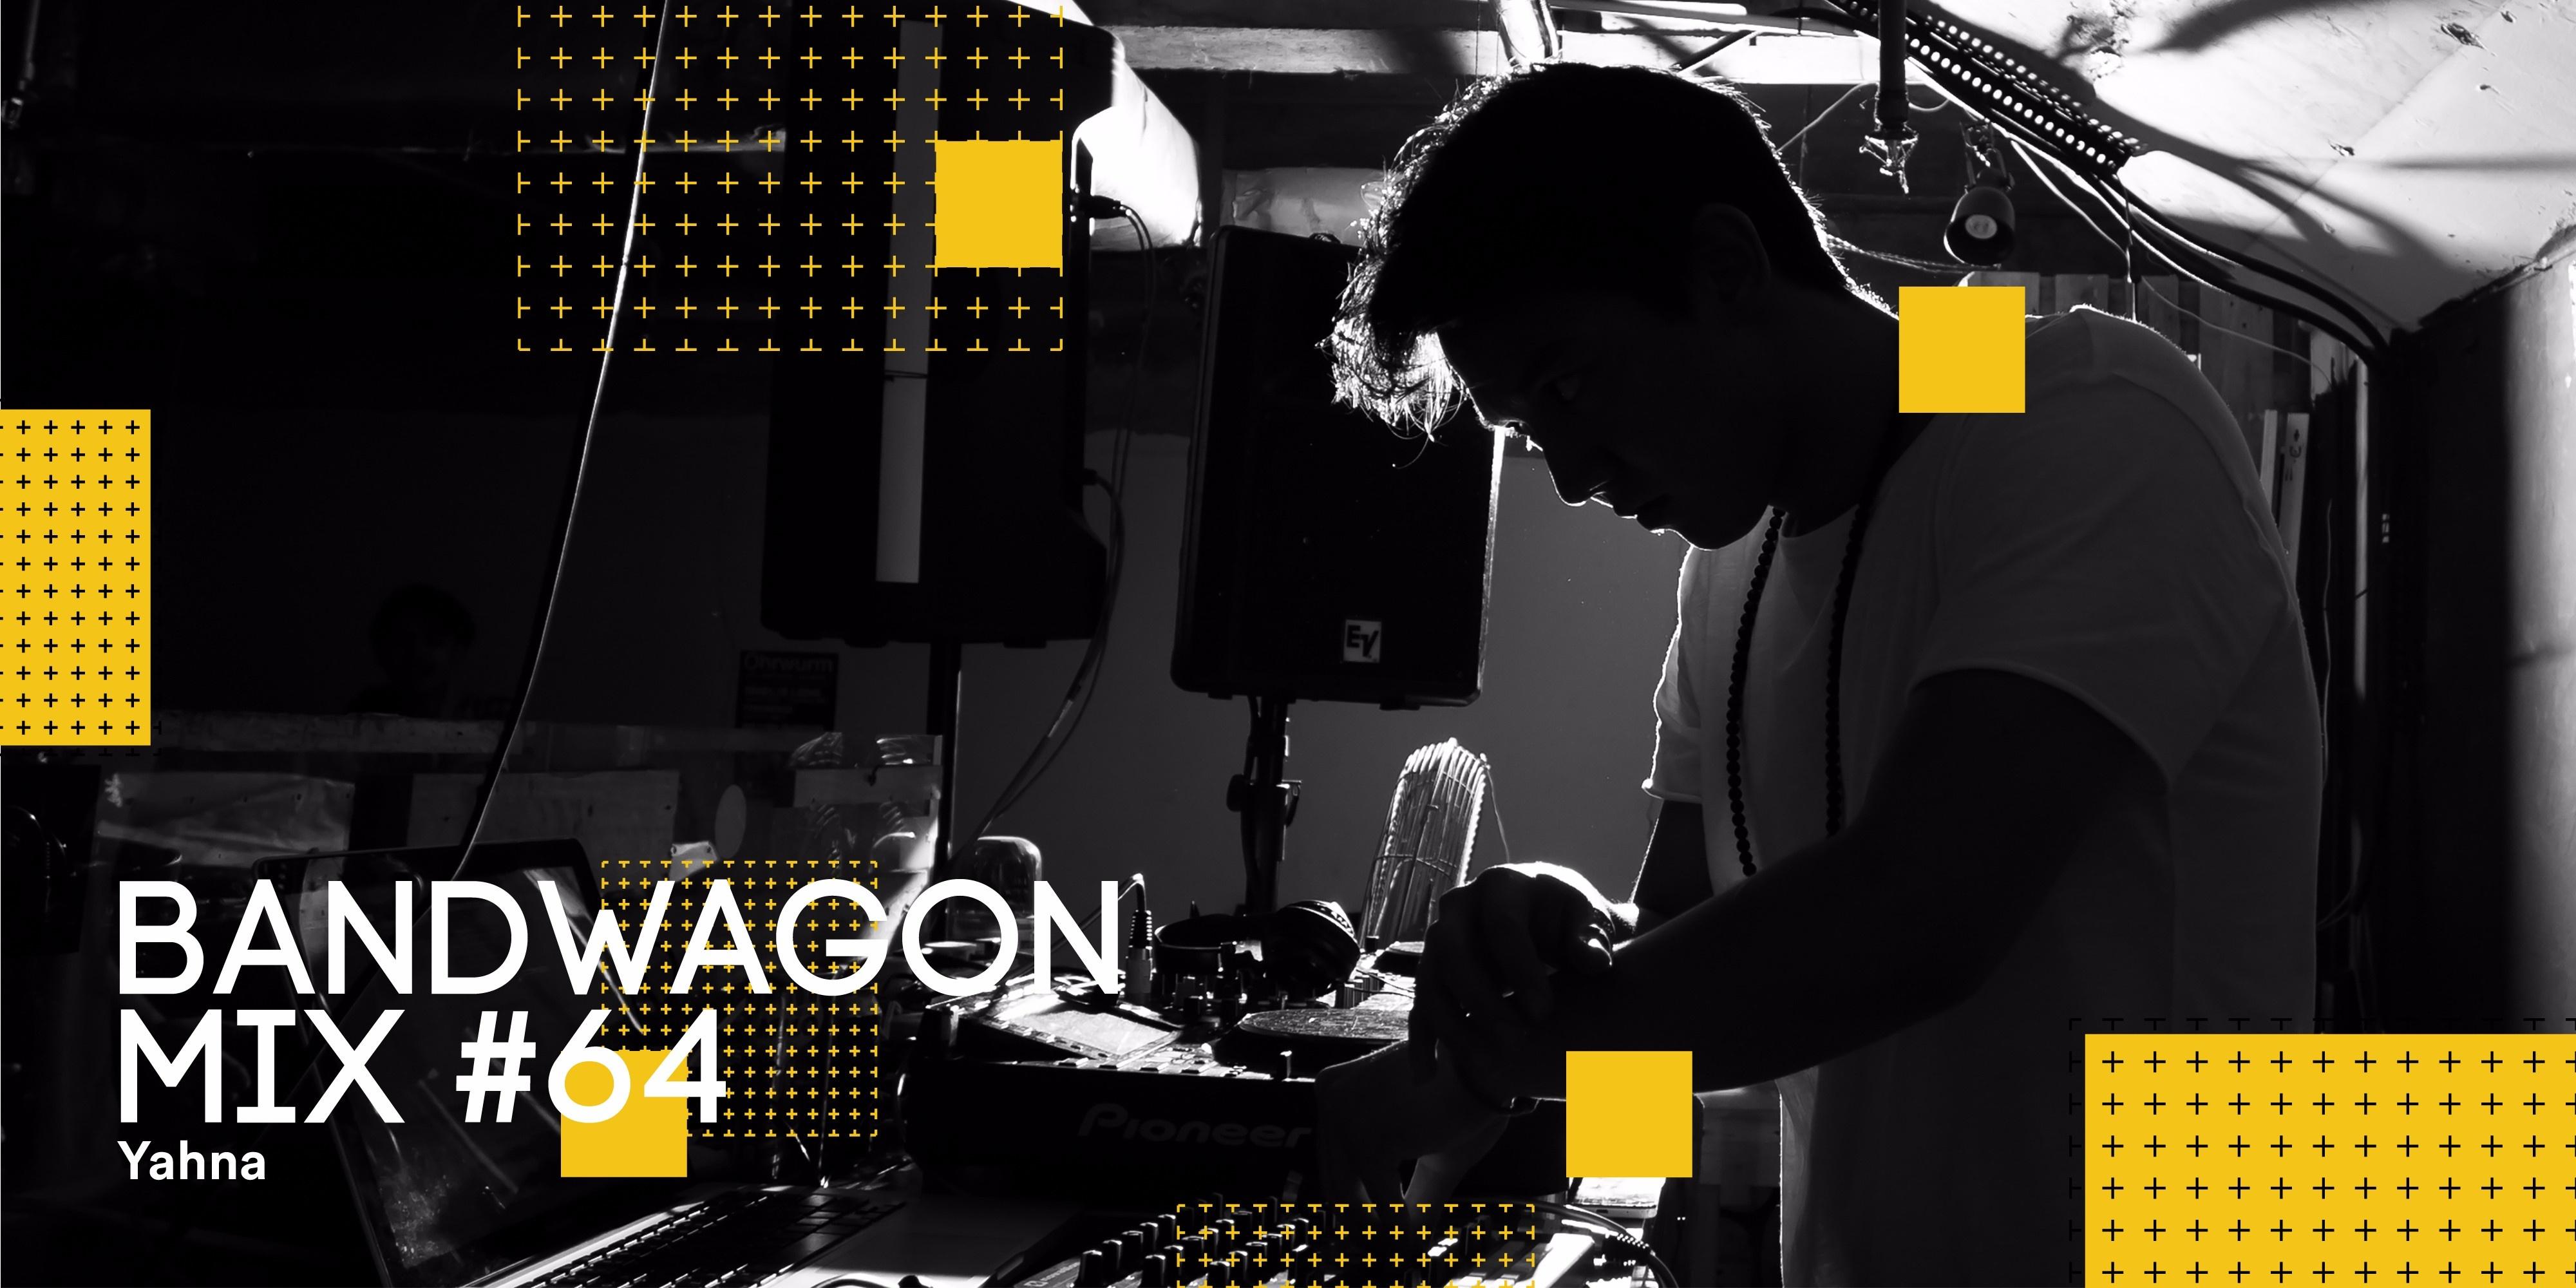 Bandwagon Mix #64: Yahna